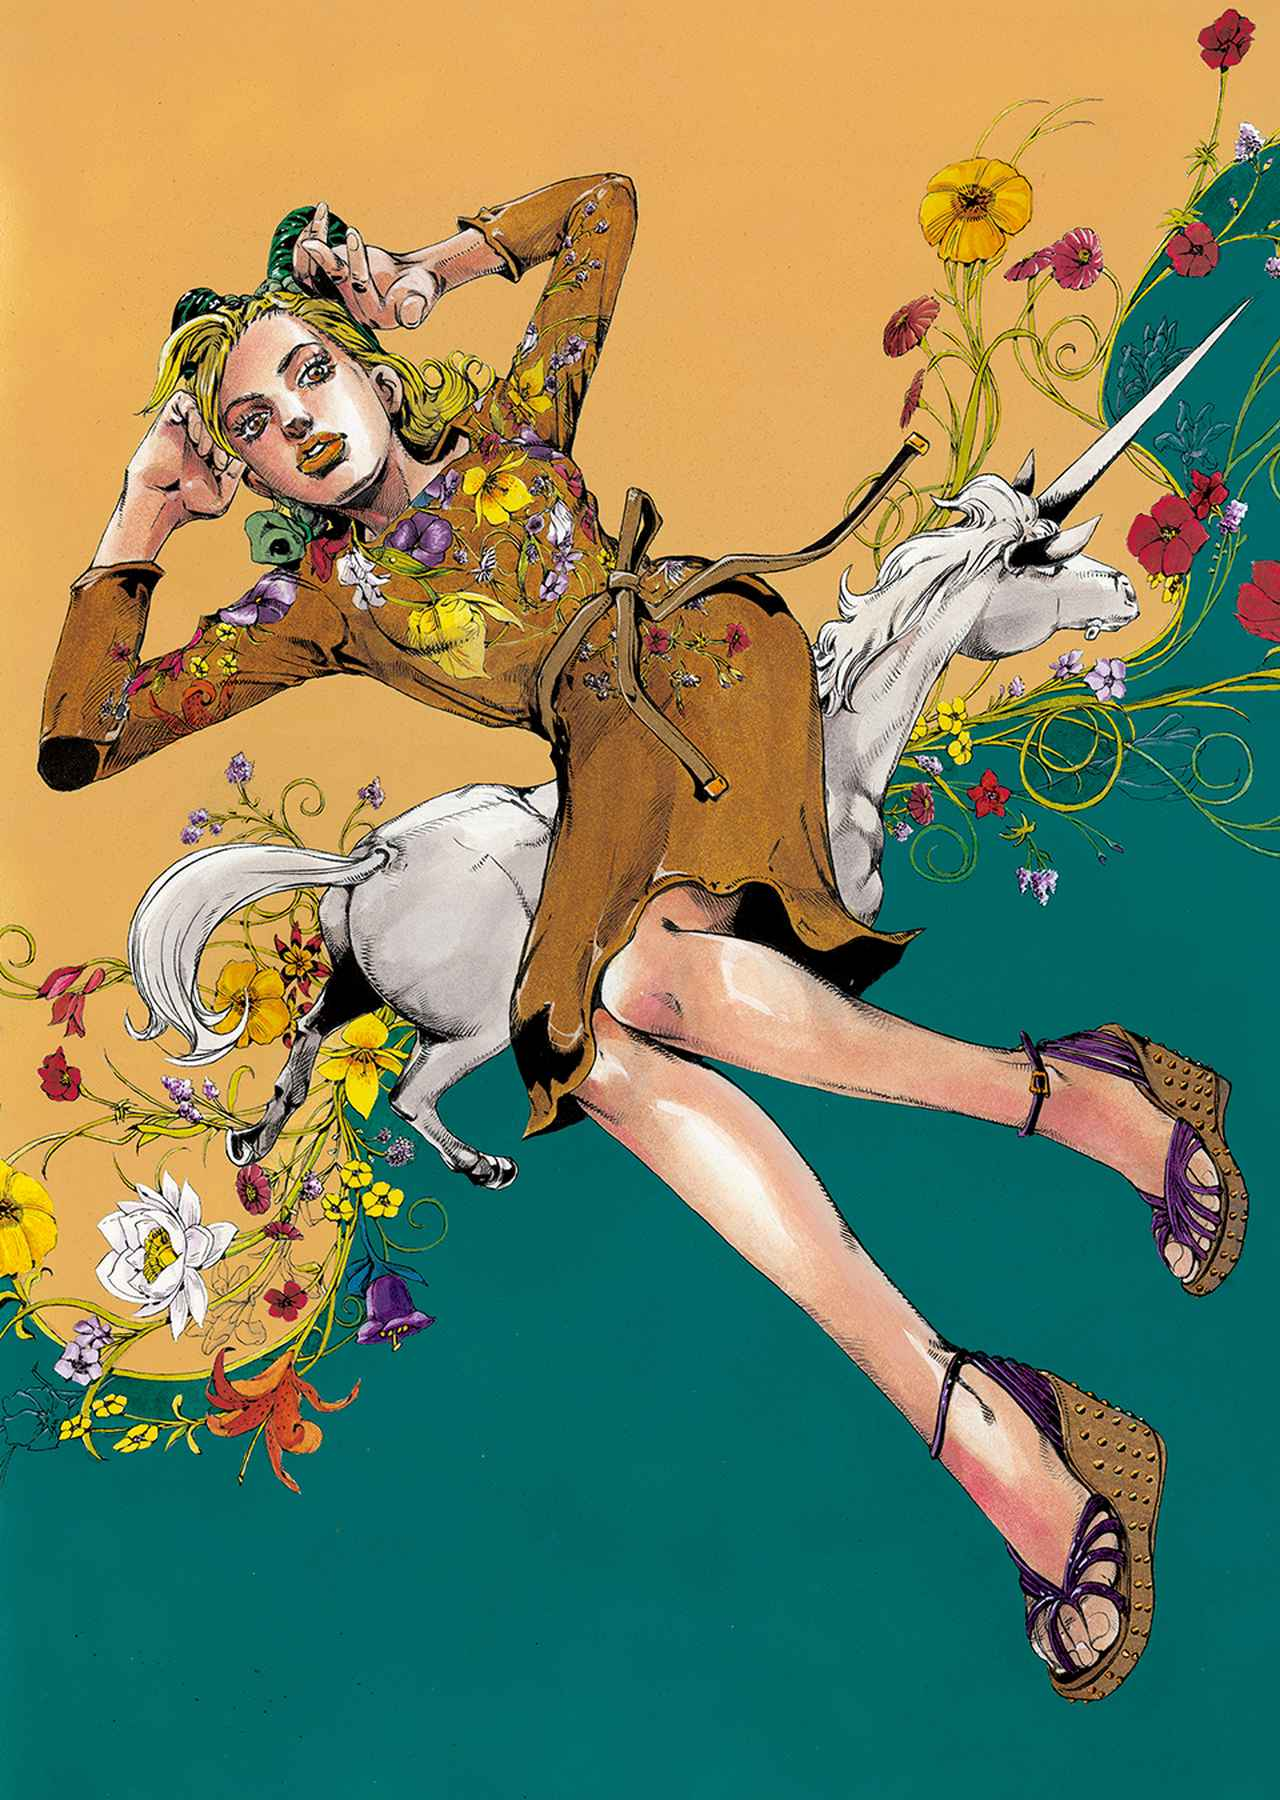 Images : 3番目の画像 - 「スペシャル インタビュー 漫画家・荒木飛呂彦の化学反応」のアルバム - T JAPAN:The New York Times Style Magazine 公式サイト